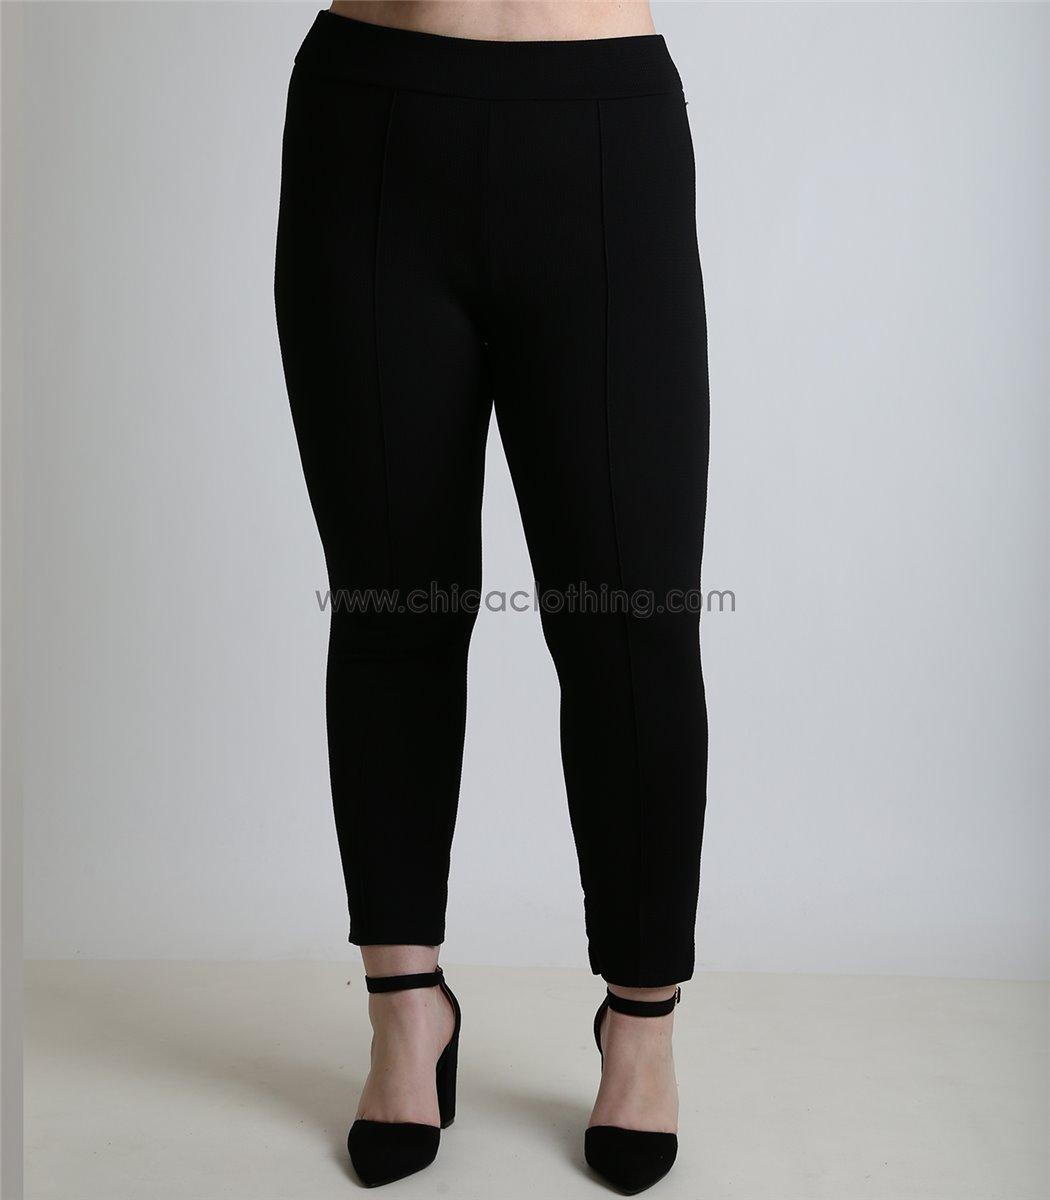 369ba376227b Γυναικείο παντελόνι - κολάν ελαστικό ψηλόμεσο (Μαύρο)